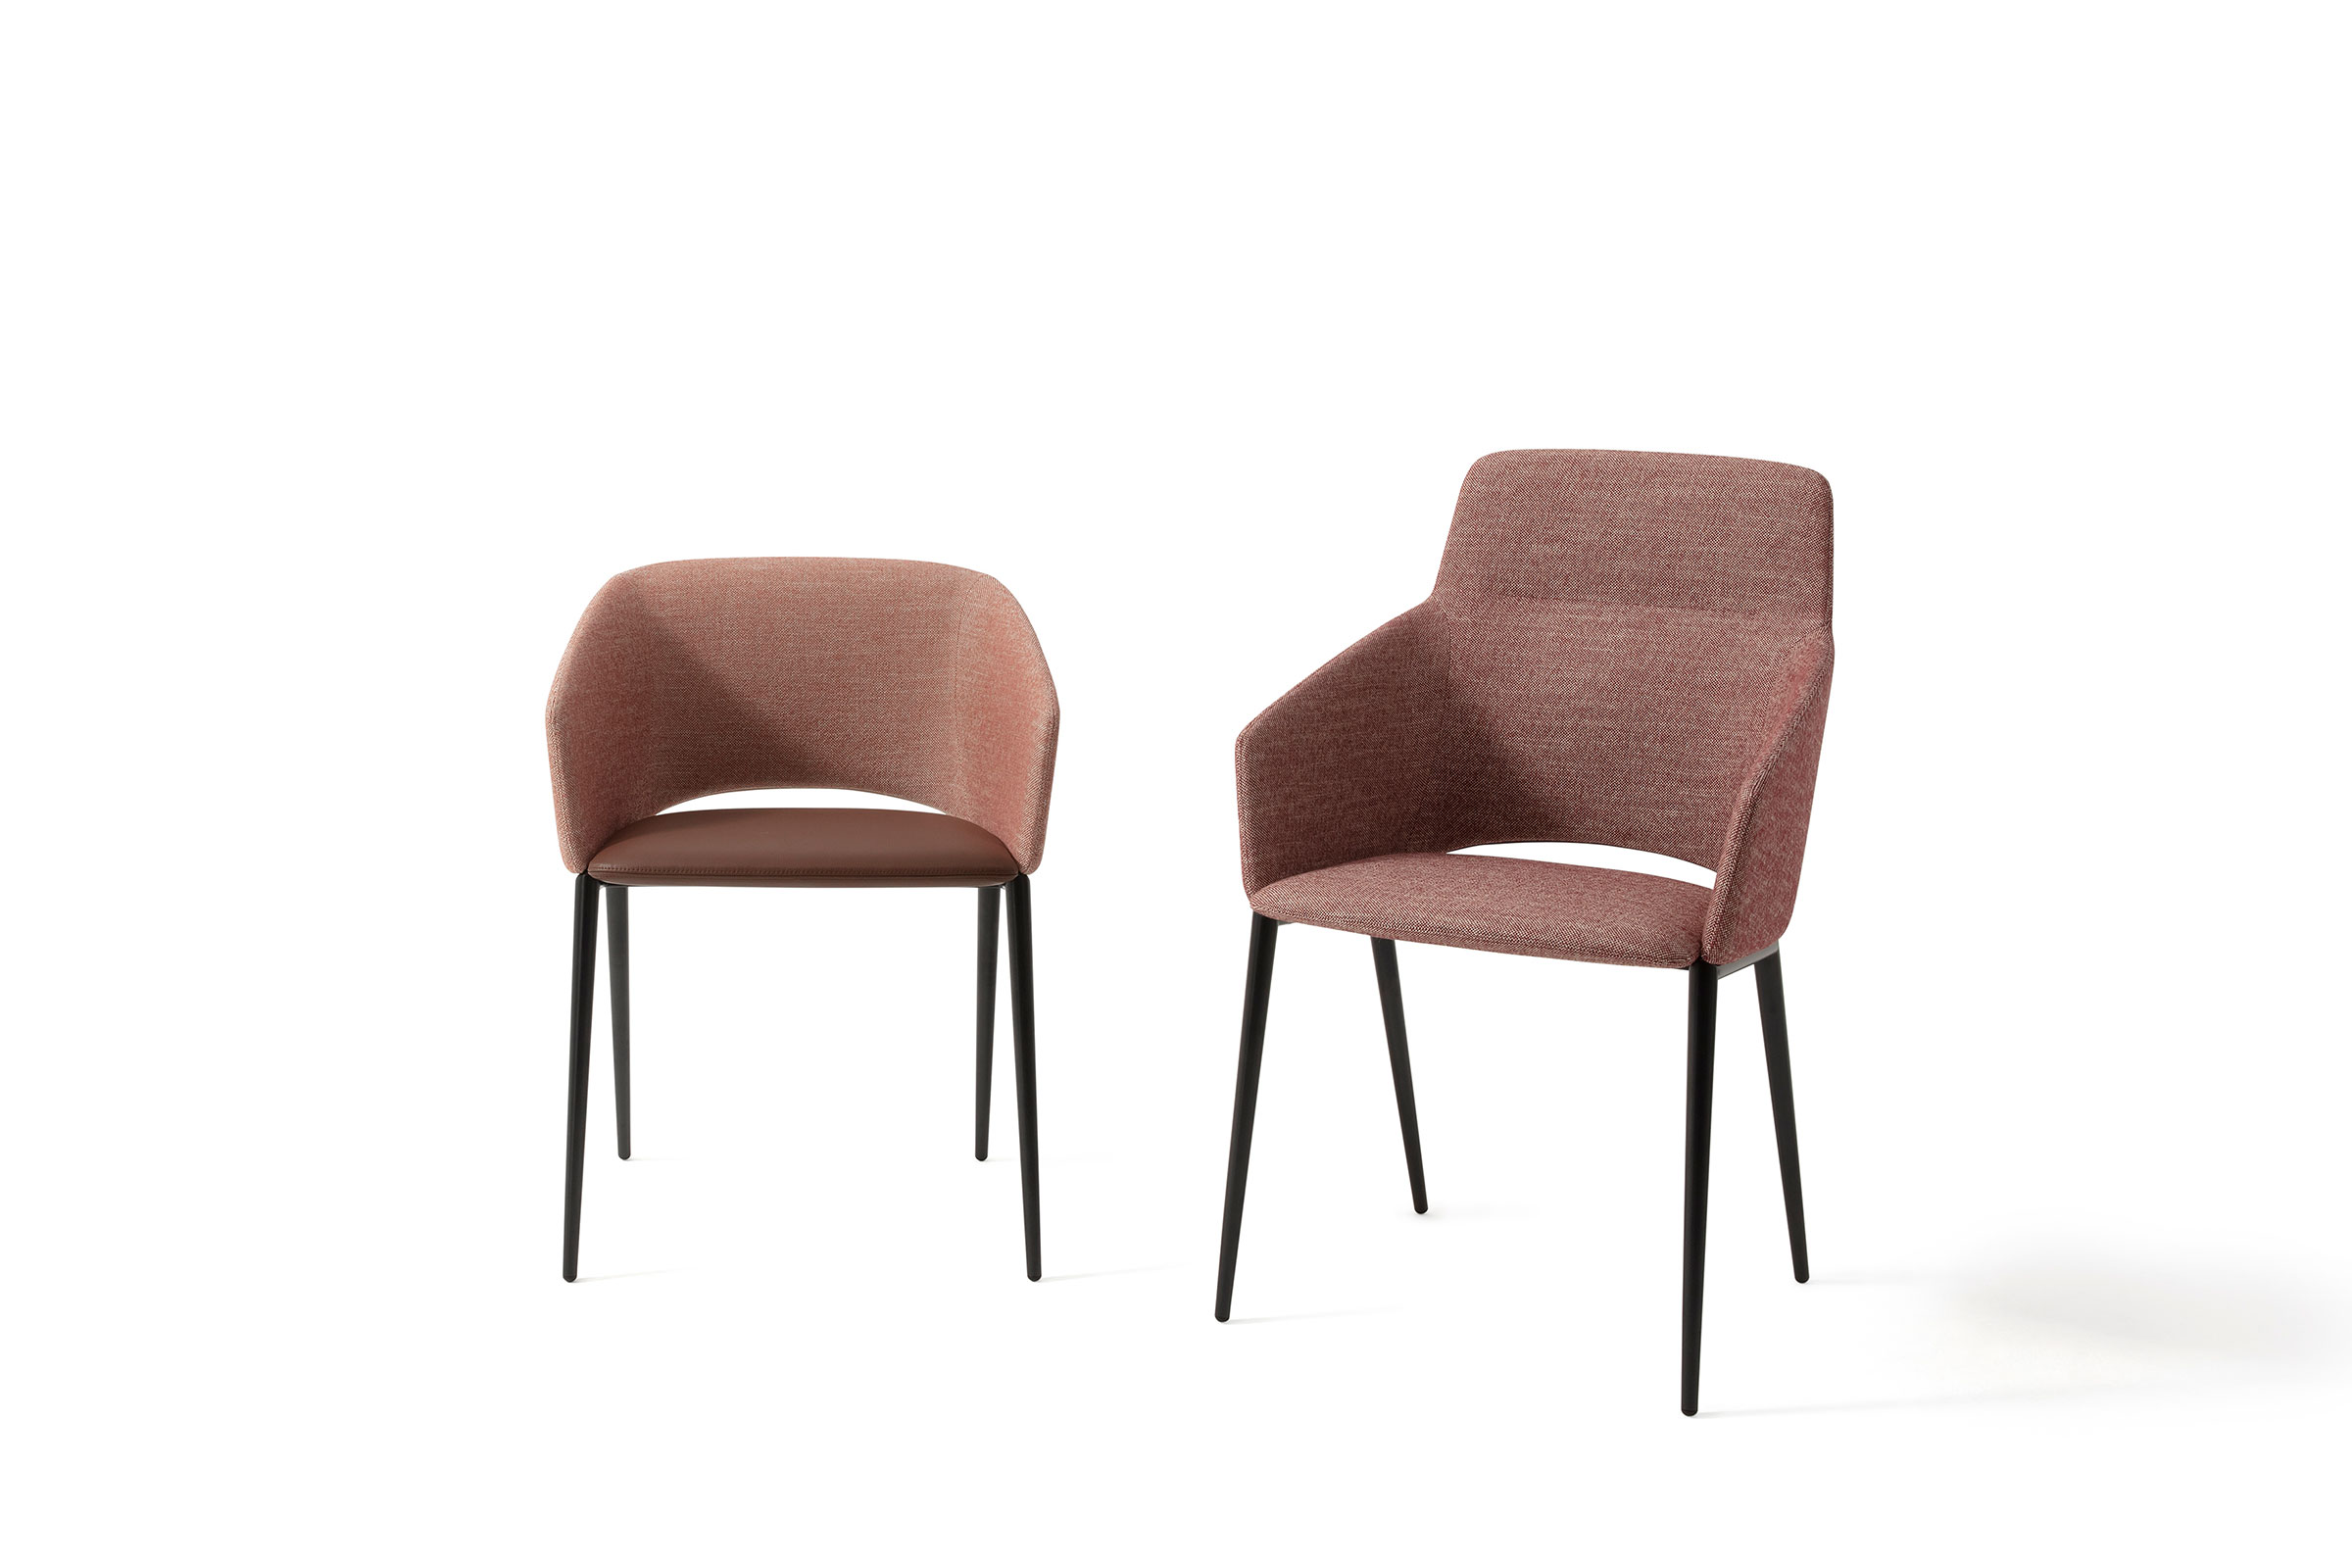 Rodolfo Dordoni's Tusa armchairs. Image courtesy of Zanotta